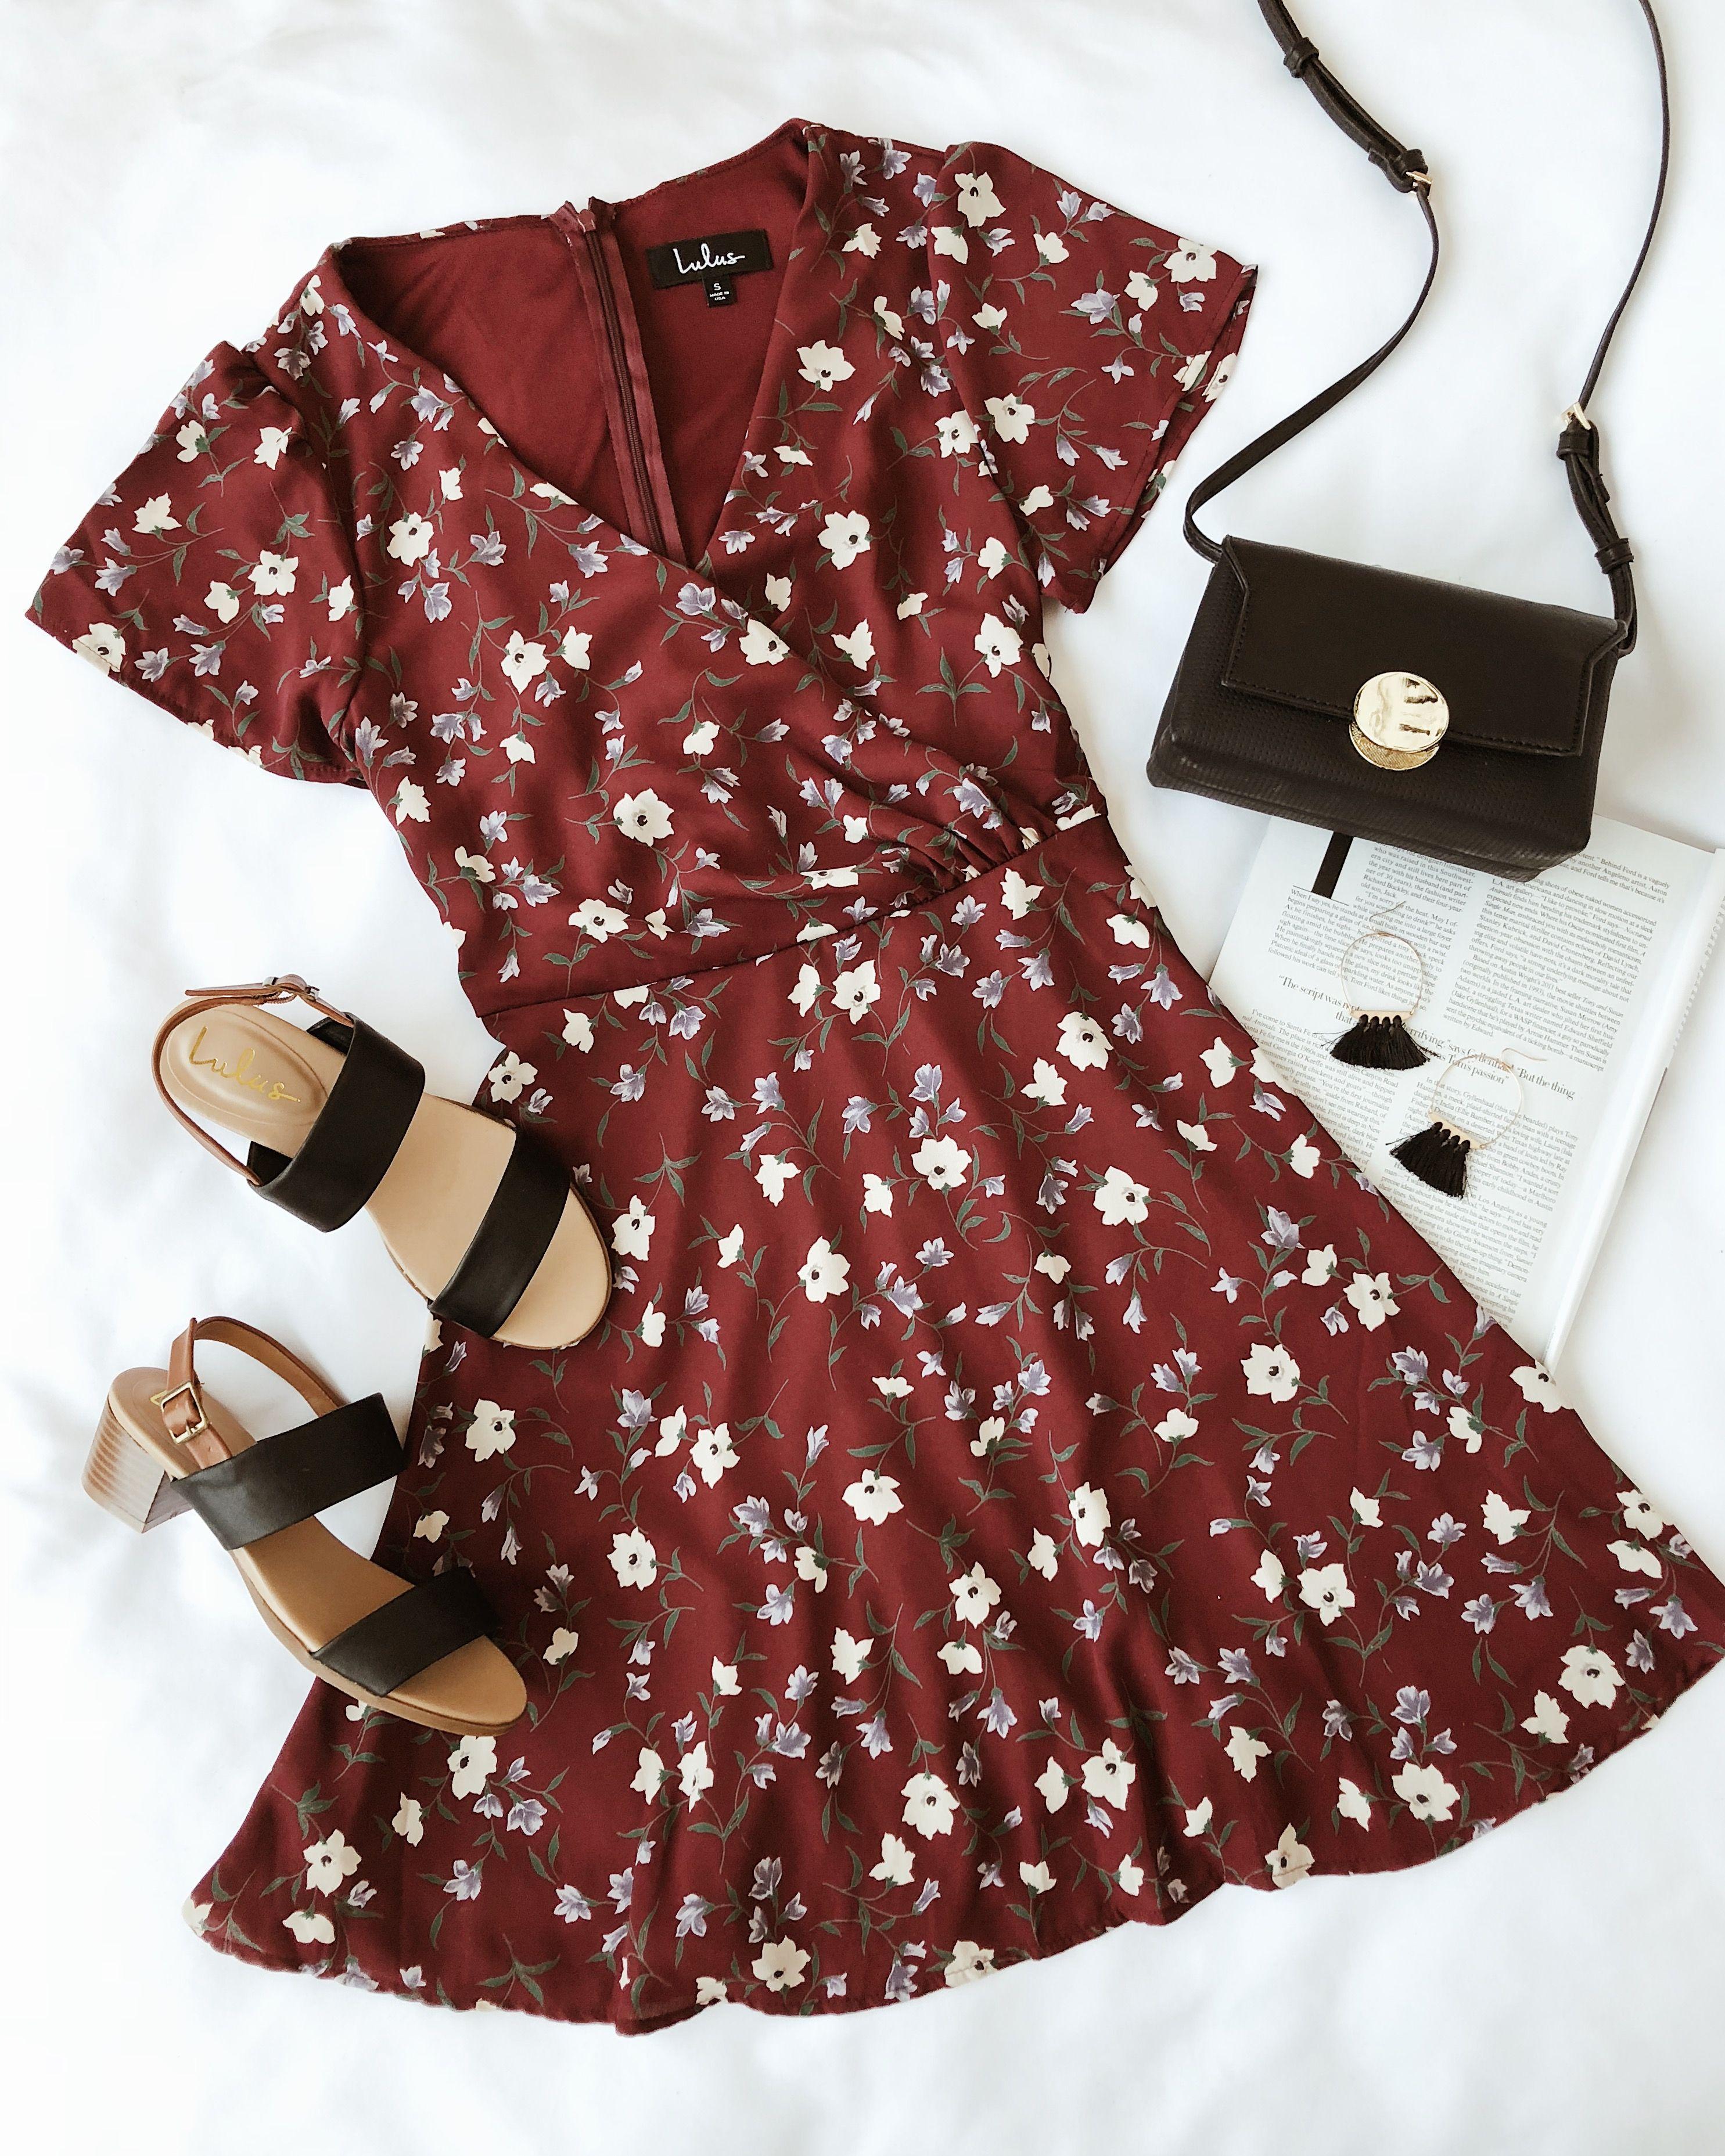 f2f235b852f Dolly Burgundy Floral Print Short Sleeve Surplice Dress in 2019 ...